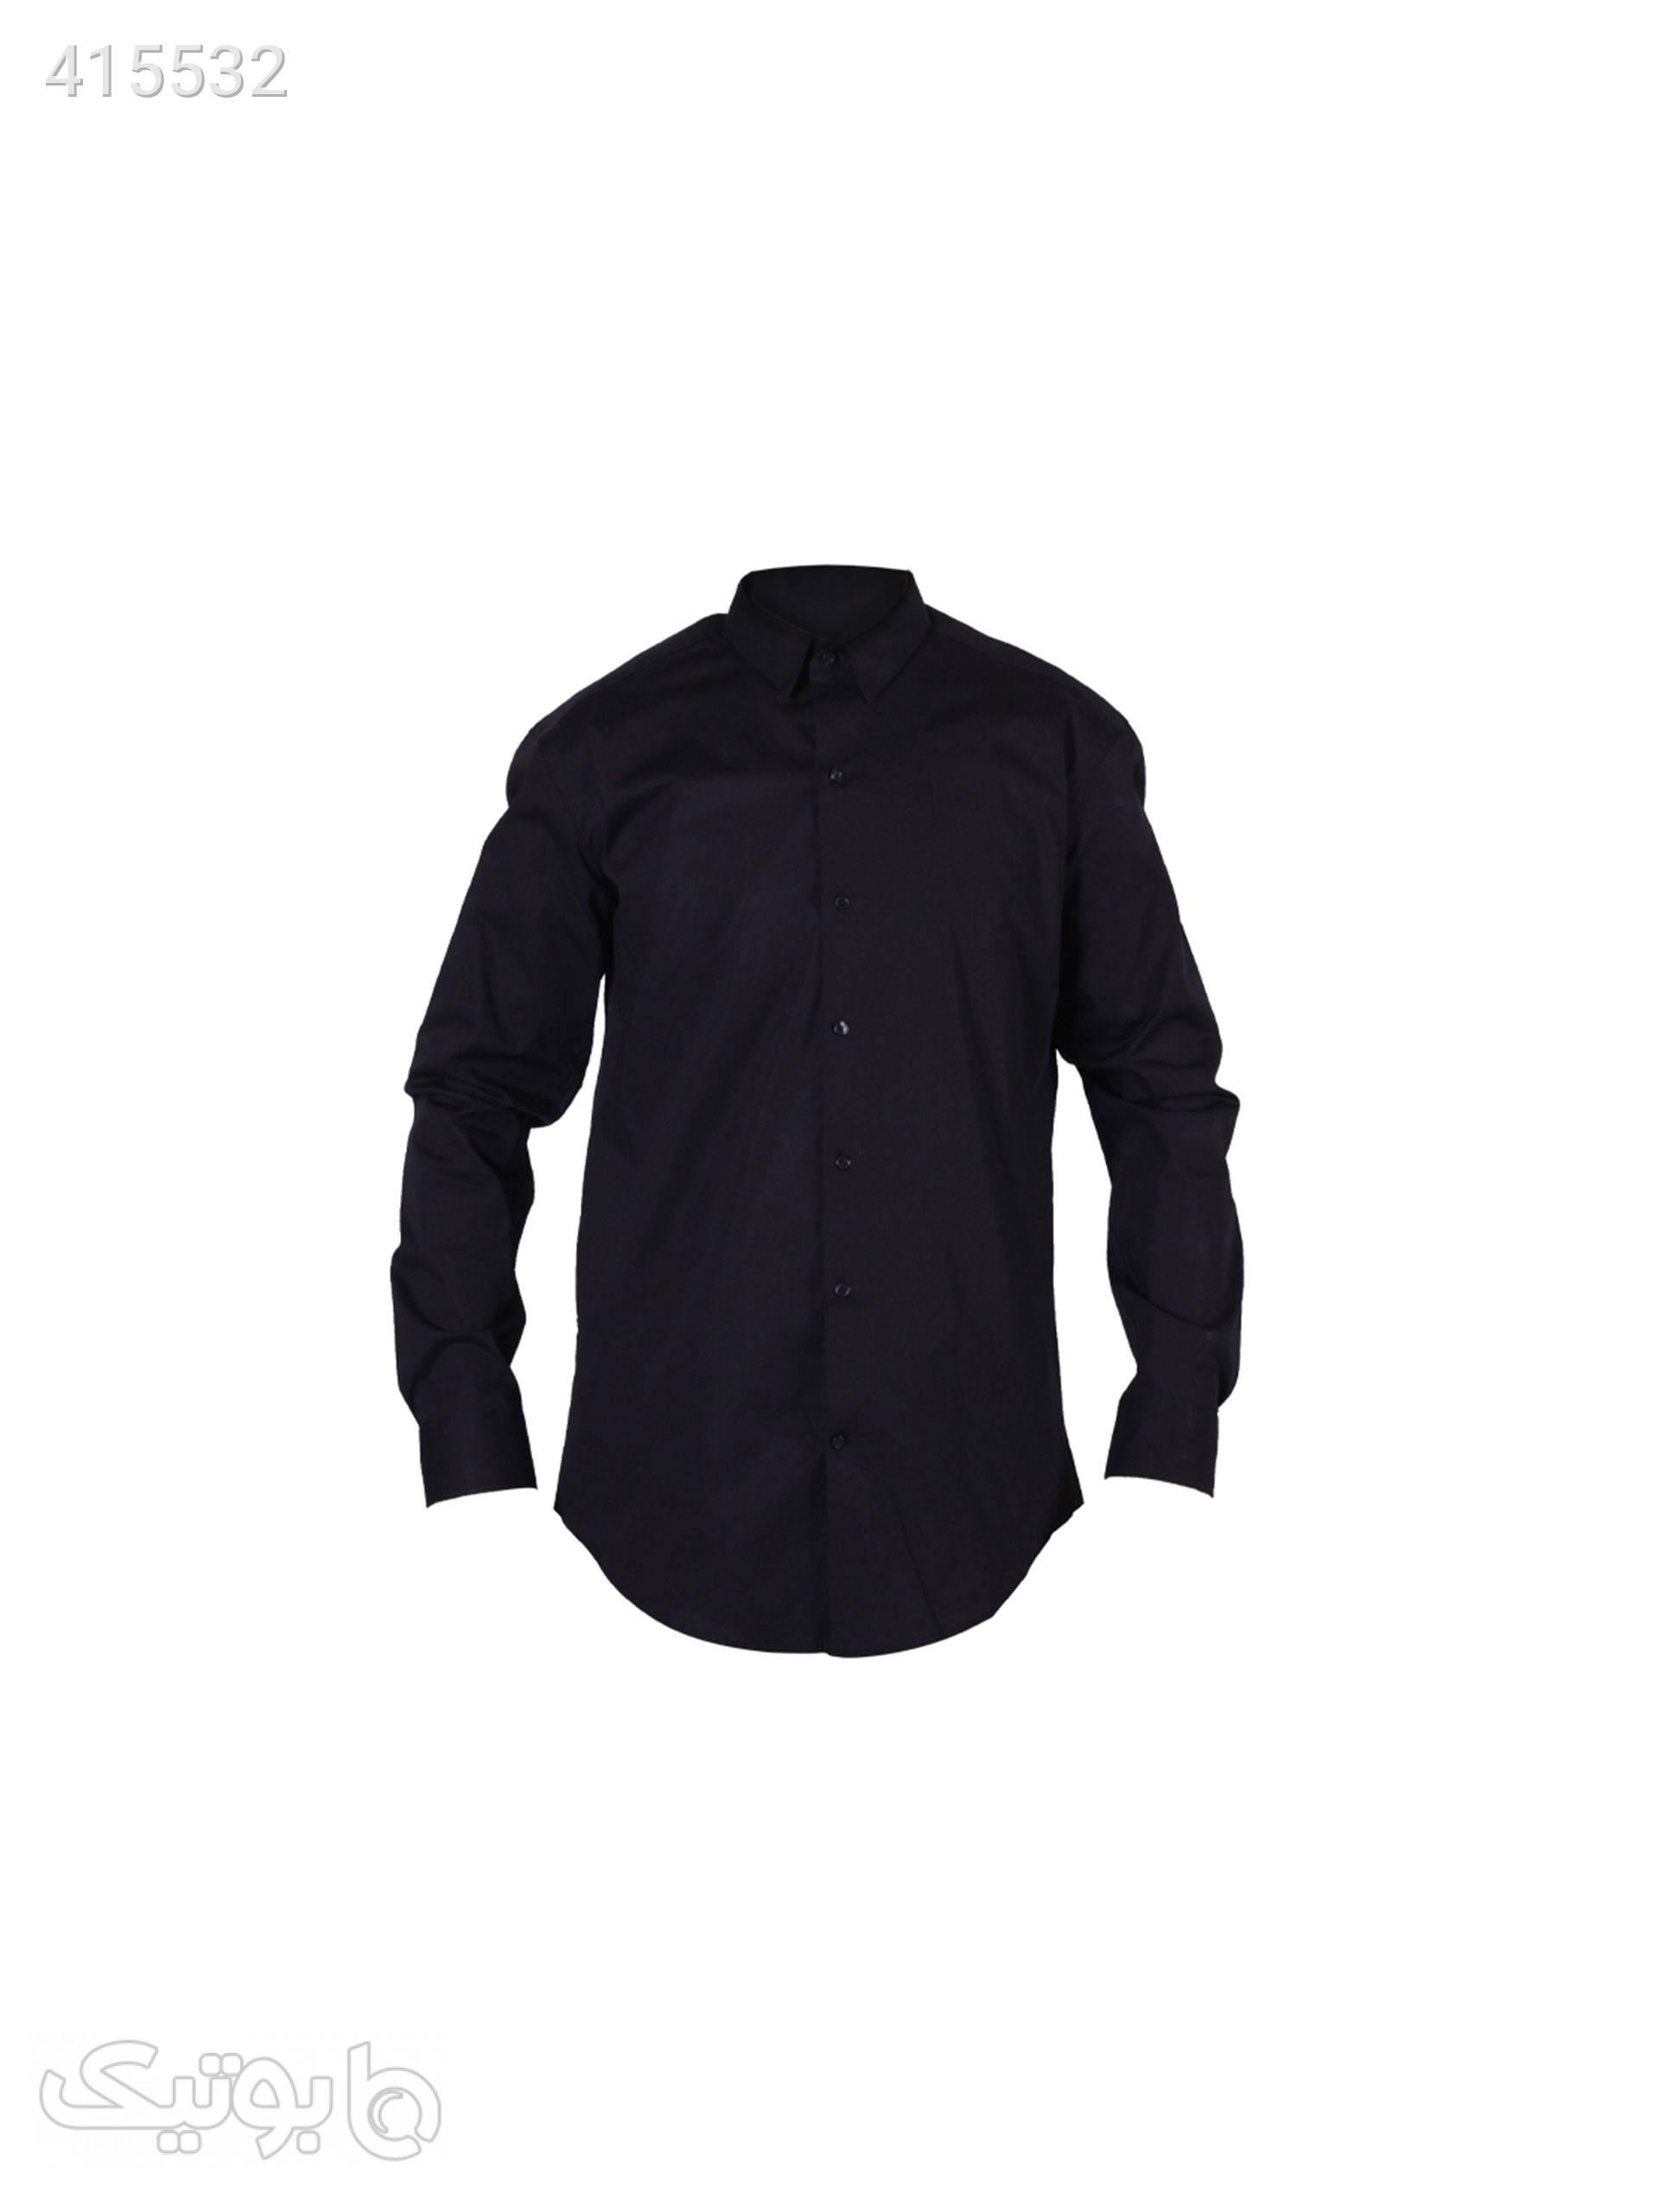 پیراهن مردانه پوپلین مشکی مشکی پيراهن مردانه